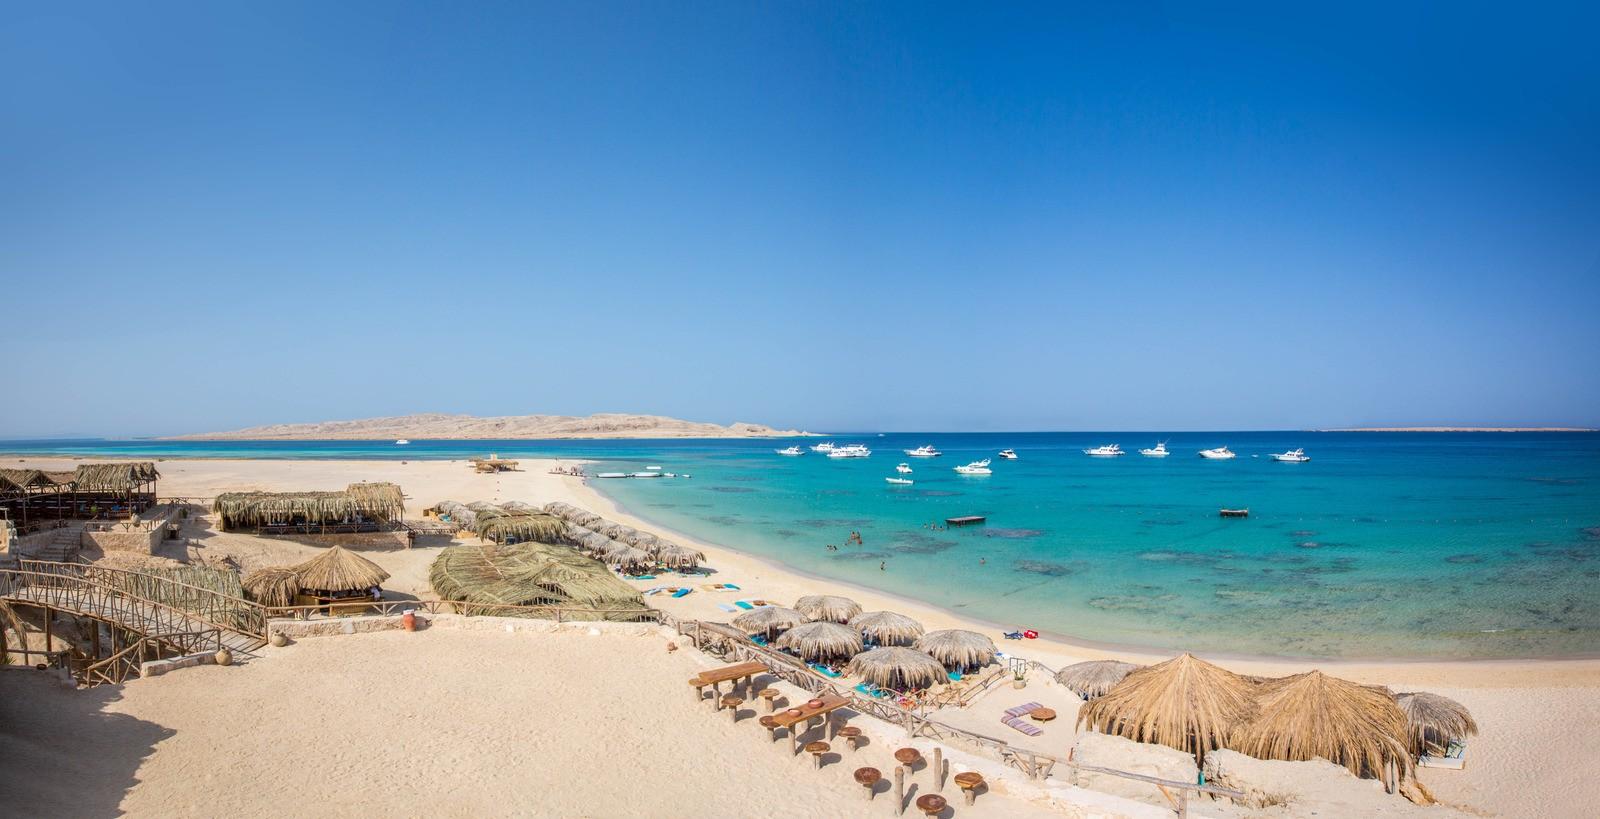 mahmya insel hurghada rotes meer Aegypten, insel mahmya, trip, beach, giftun insel, giftun mahmya beach,